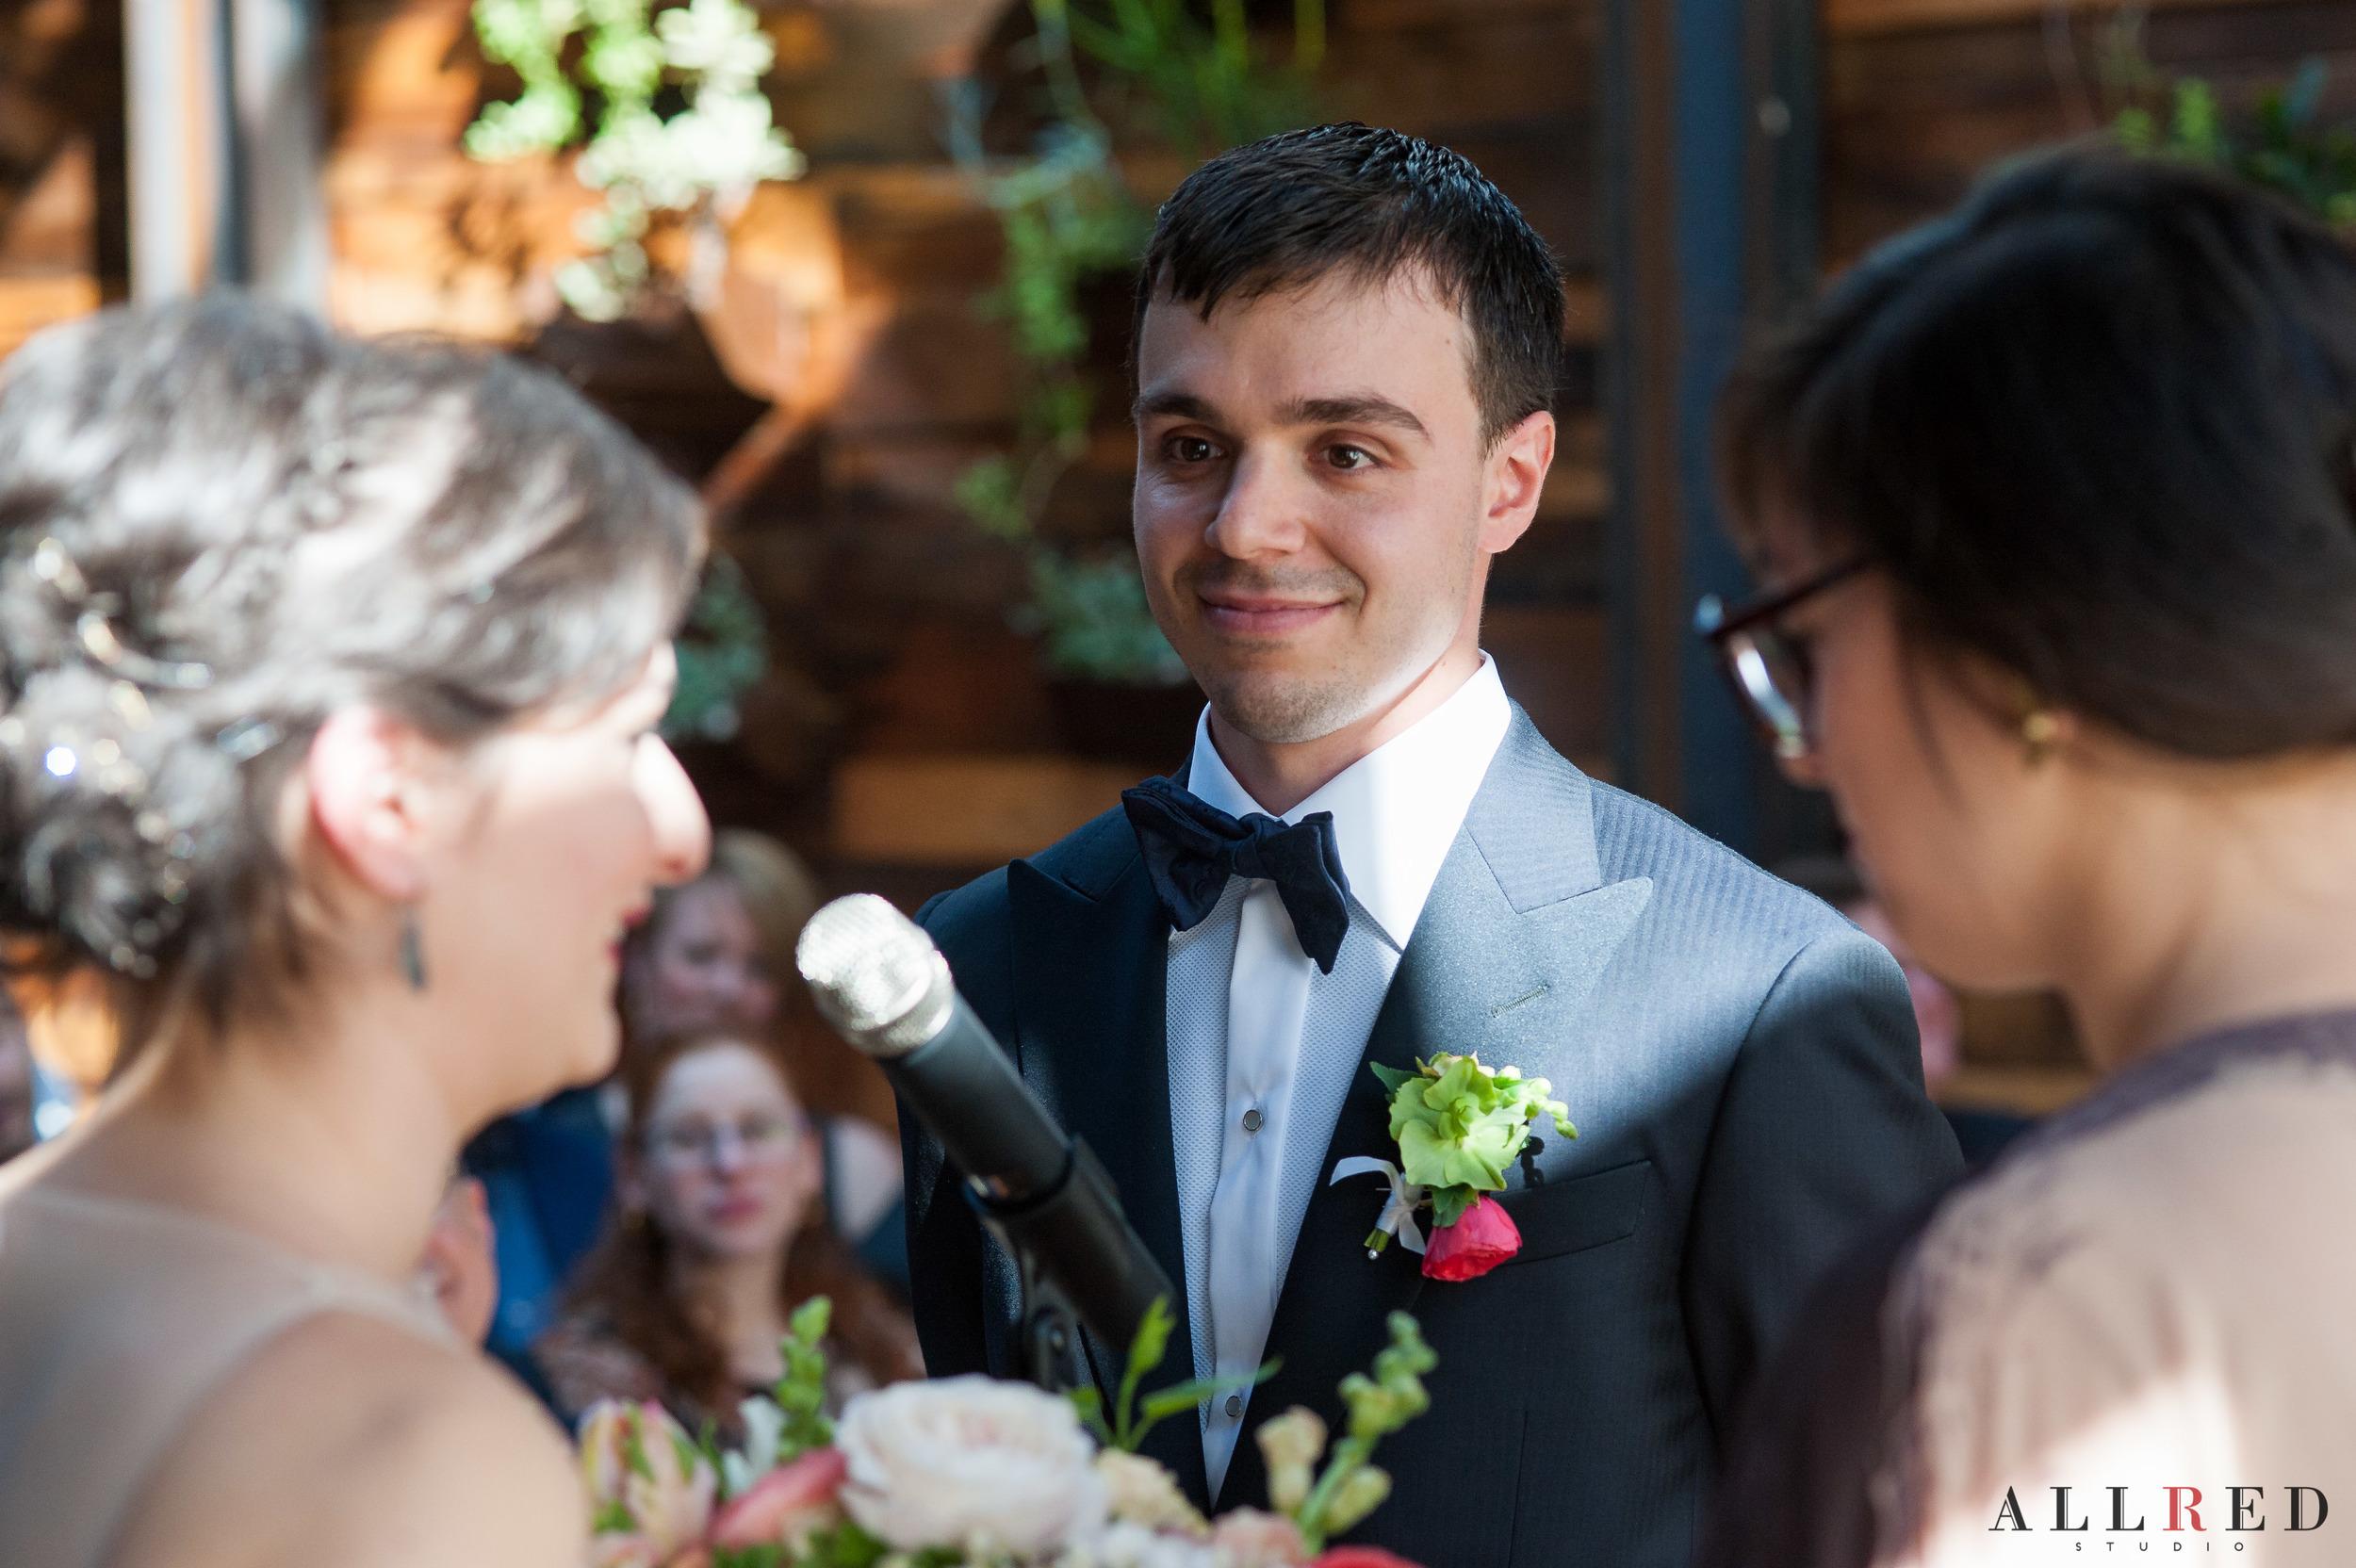 Wedding-Brooklyn-winery-allred-studio-new-york-photographer-new-jersey-hudson-valley-00847.jpg